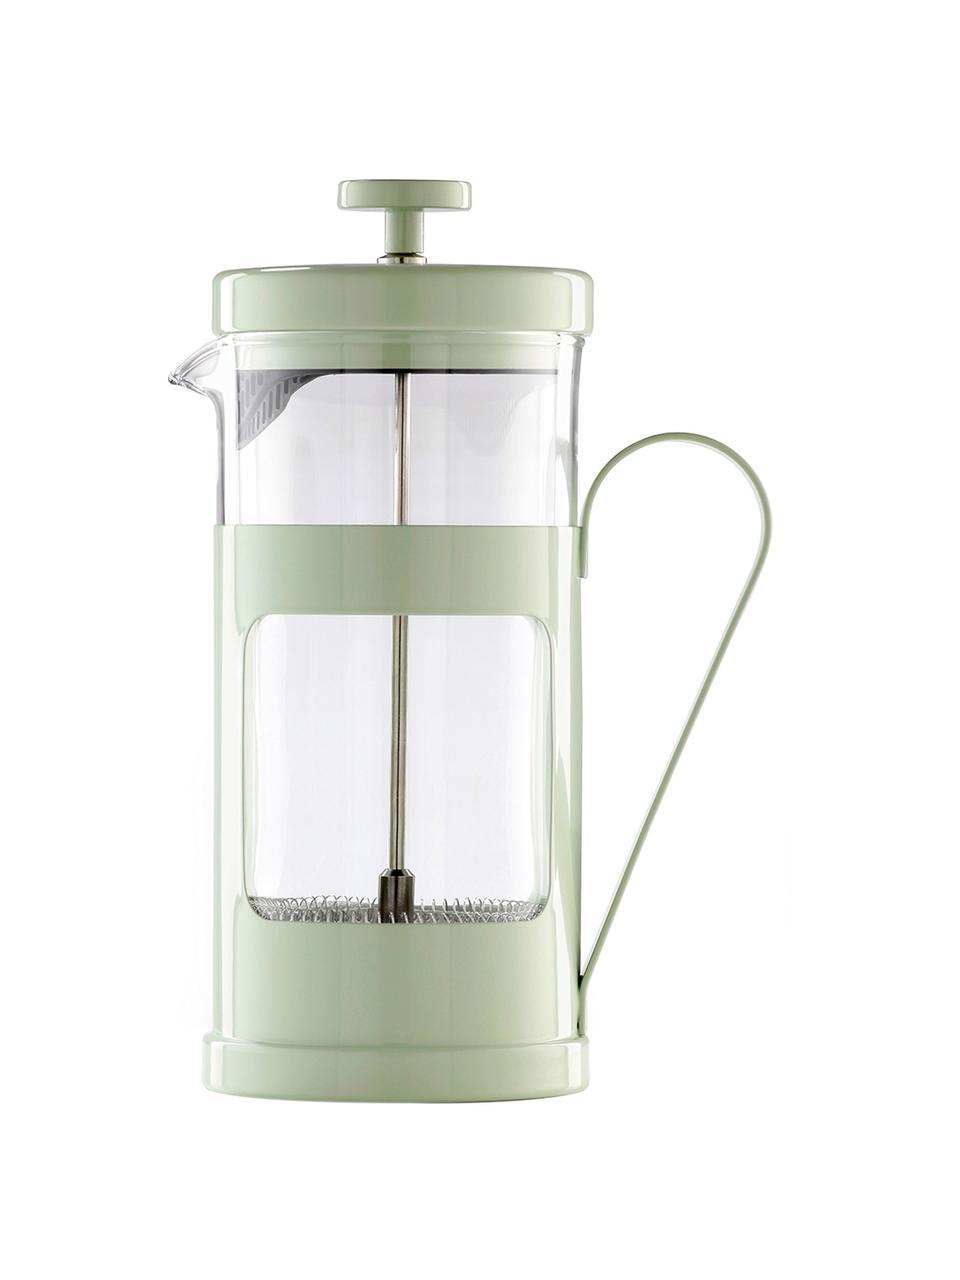 Kaffeebereiter Monaco in Mint, Edelstahl lackiert, Borosilikatglas, Transparent, Mint, 1 L